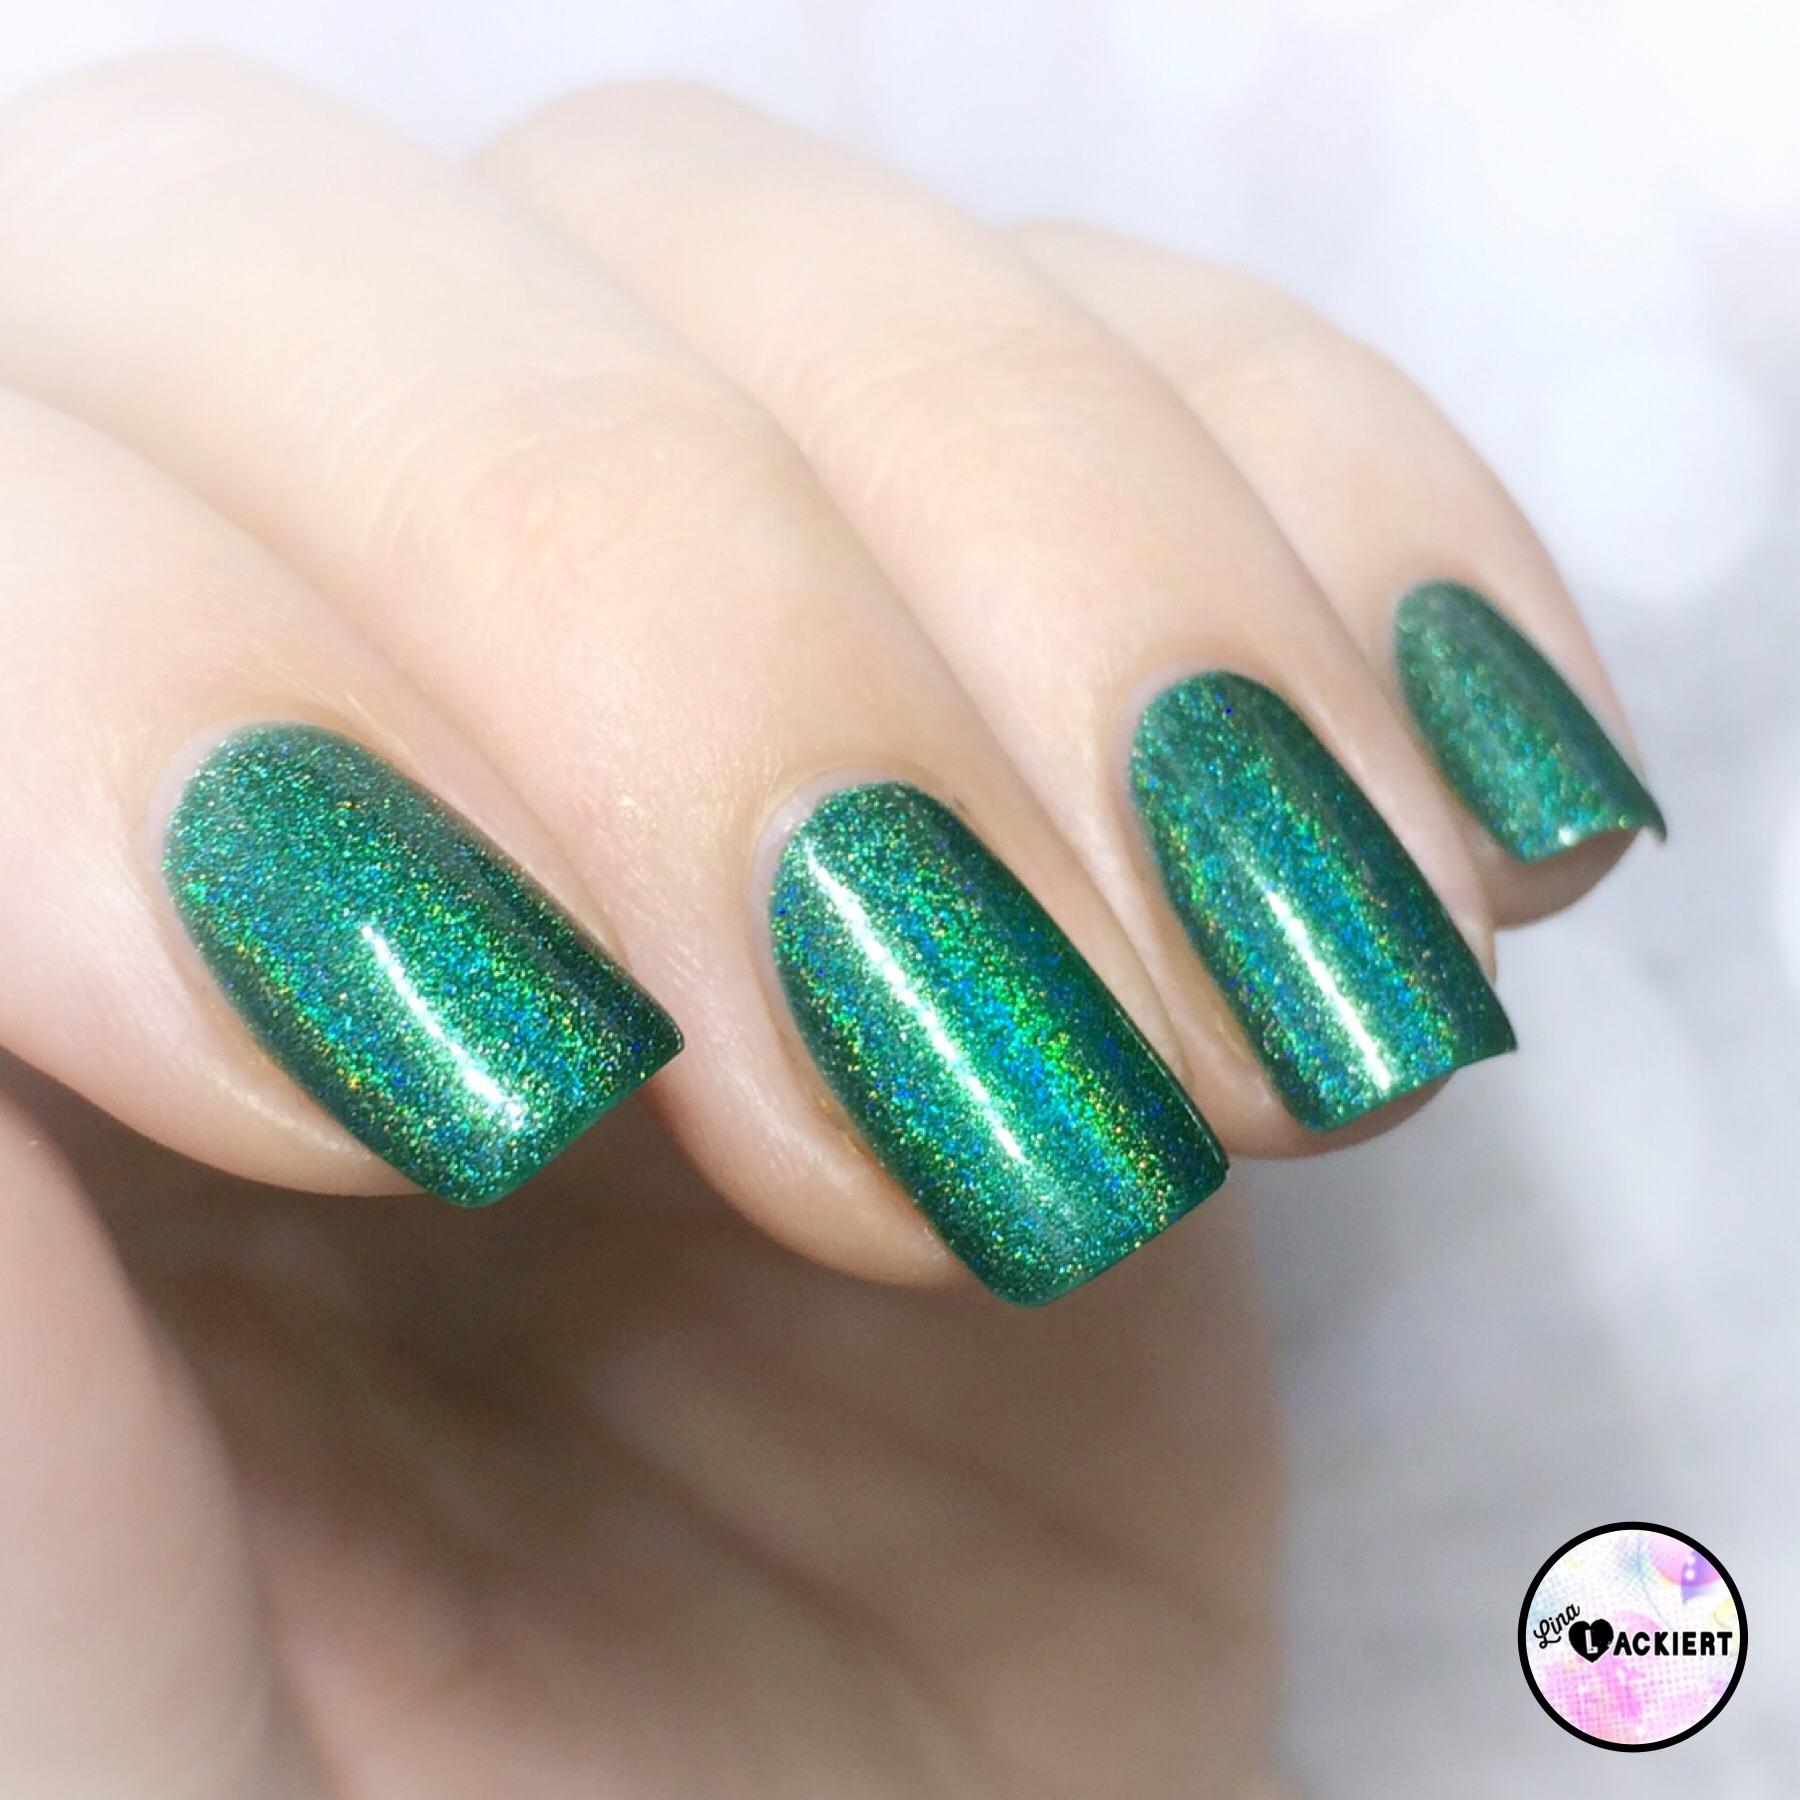 Born Pretty Holo Polish // Ein Traum in Grün | Lina-Lackiert